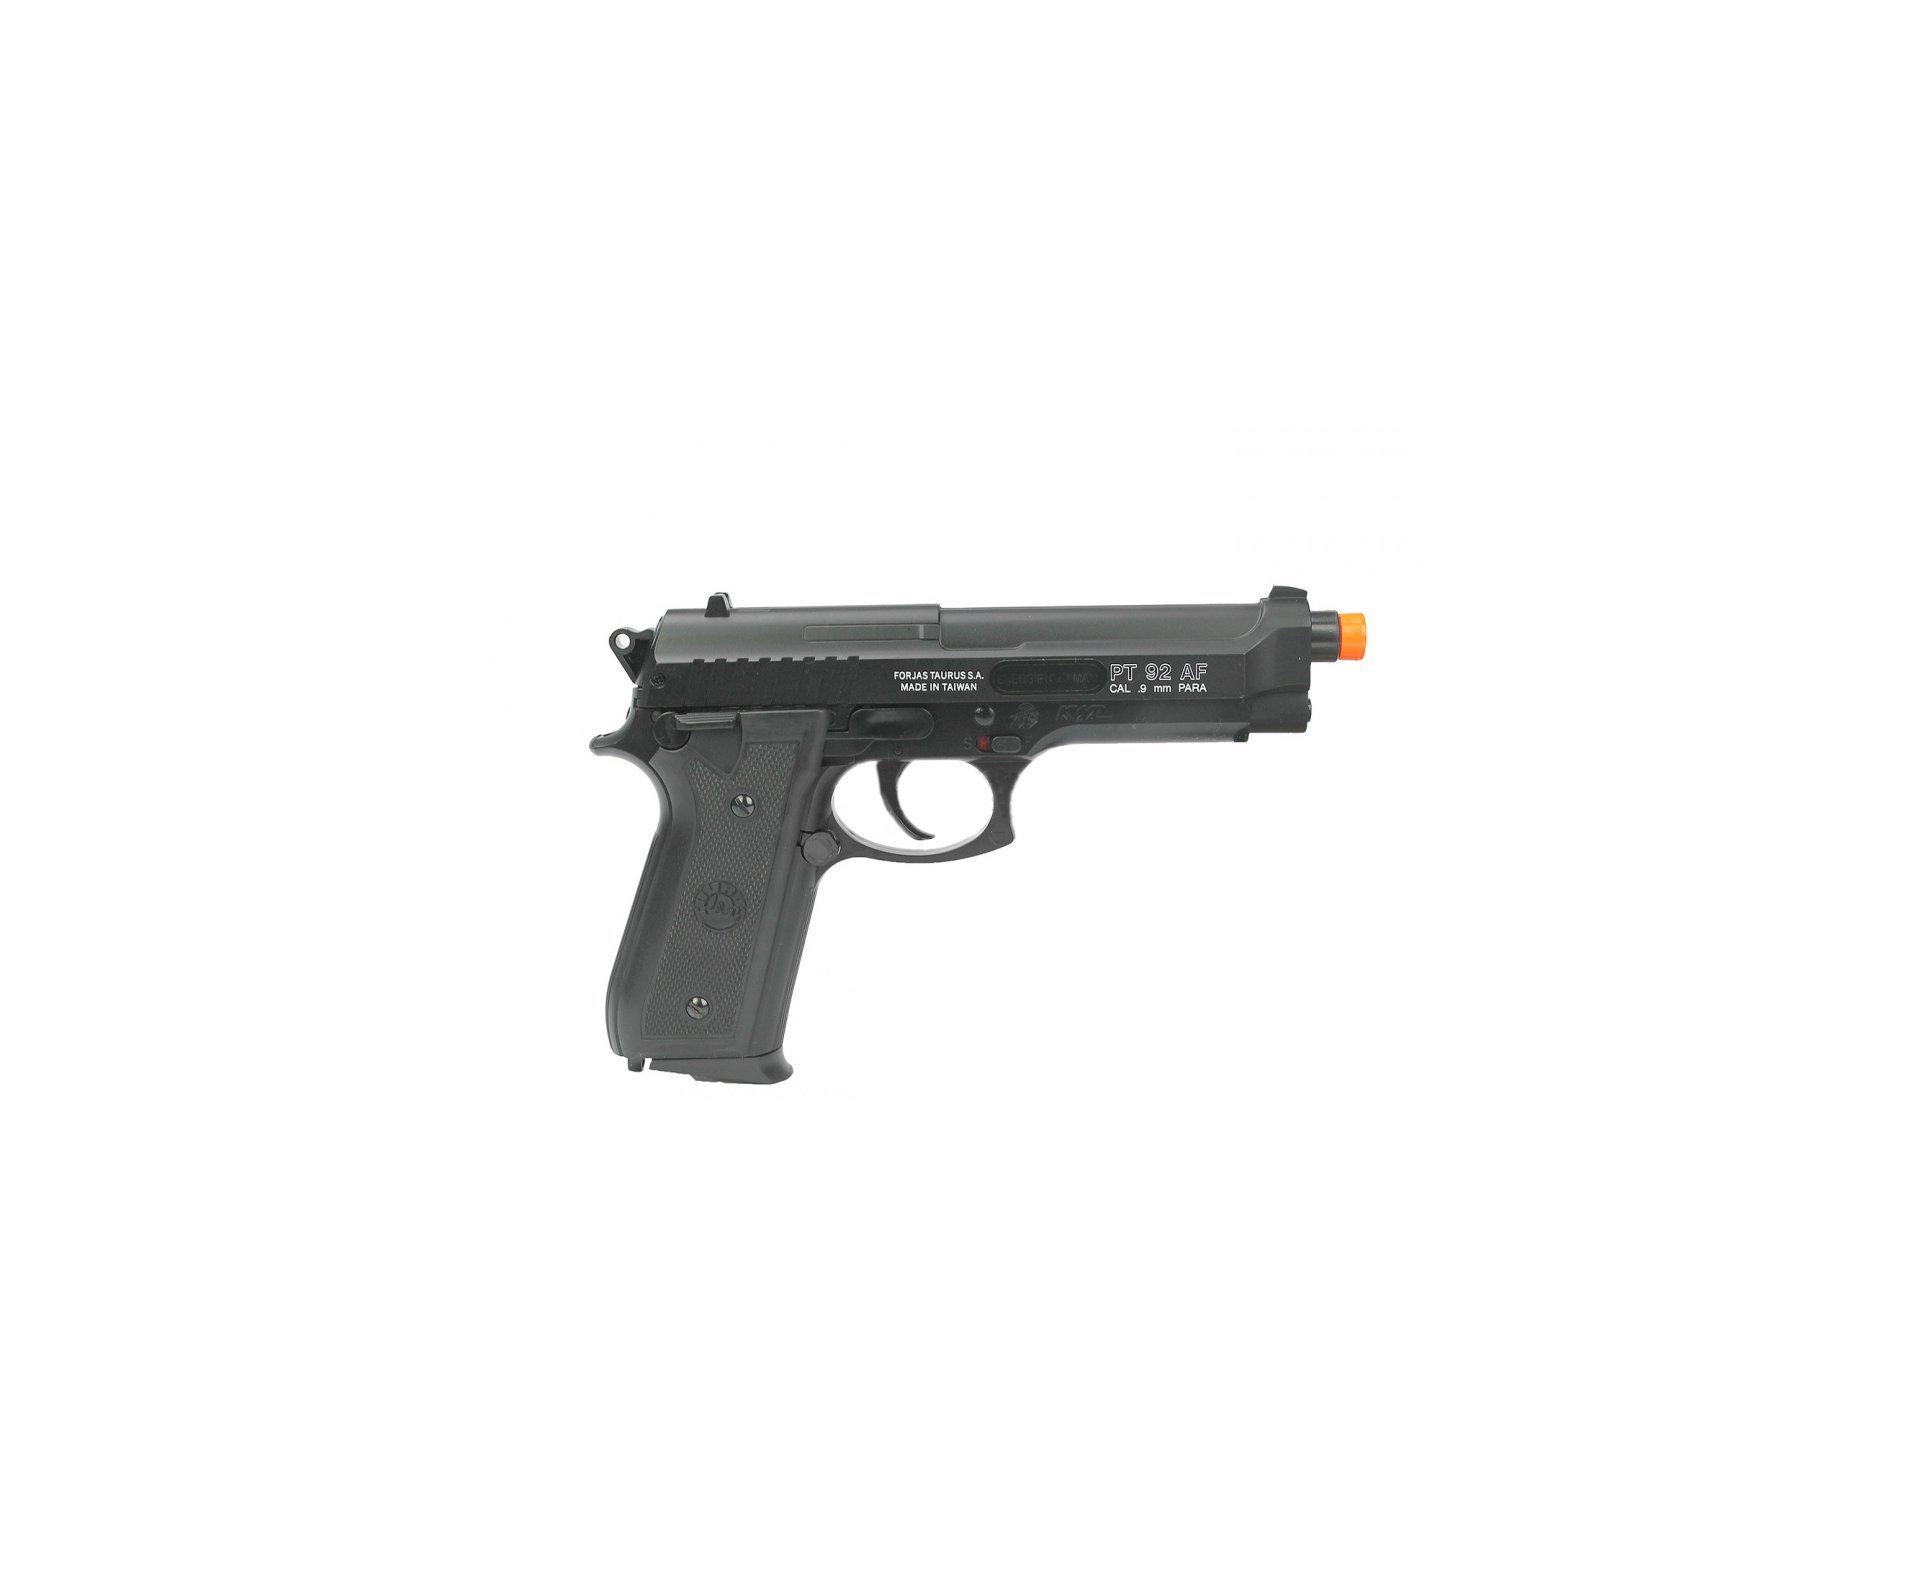 Pistola De Airsoft Taurus Pt 92 - Slide Metal Cal 6,0mm - Original Cybergun